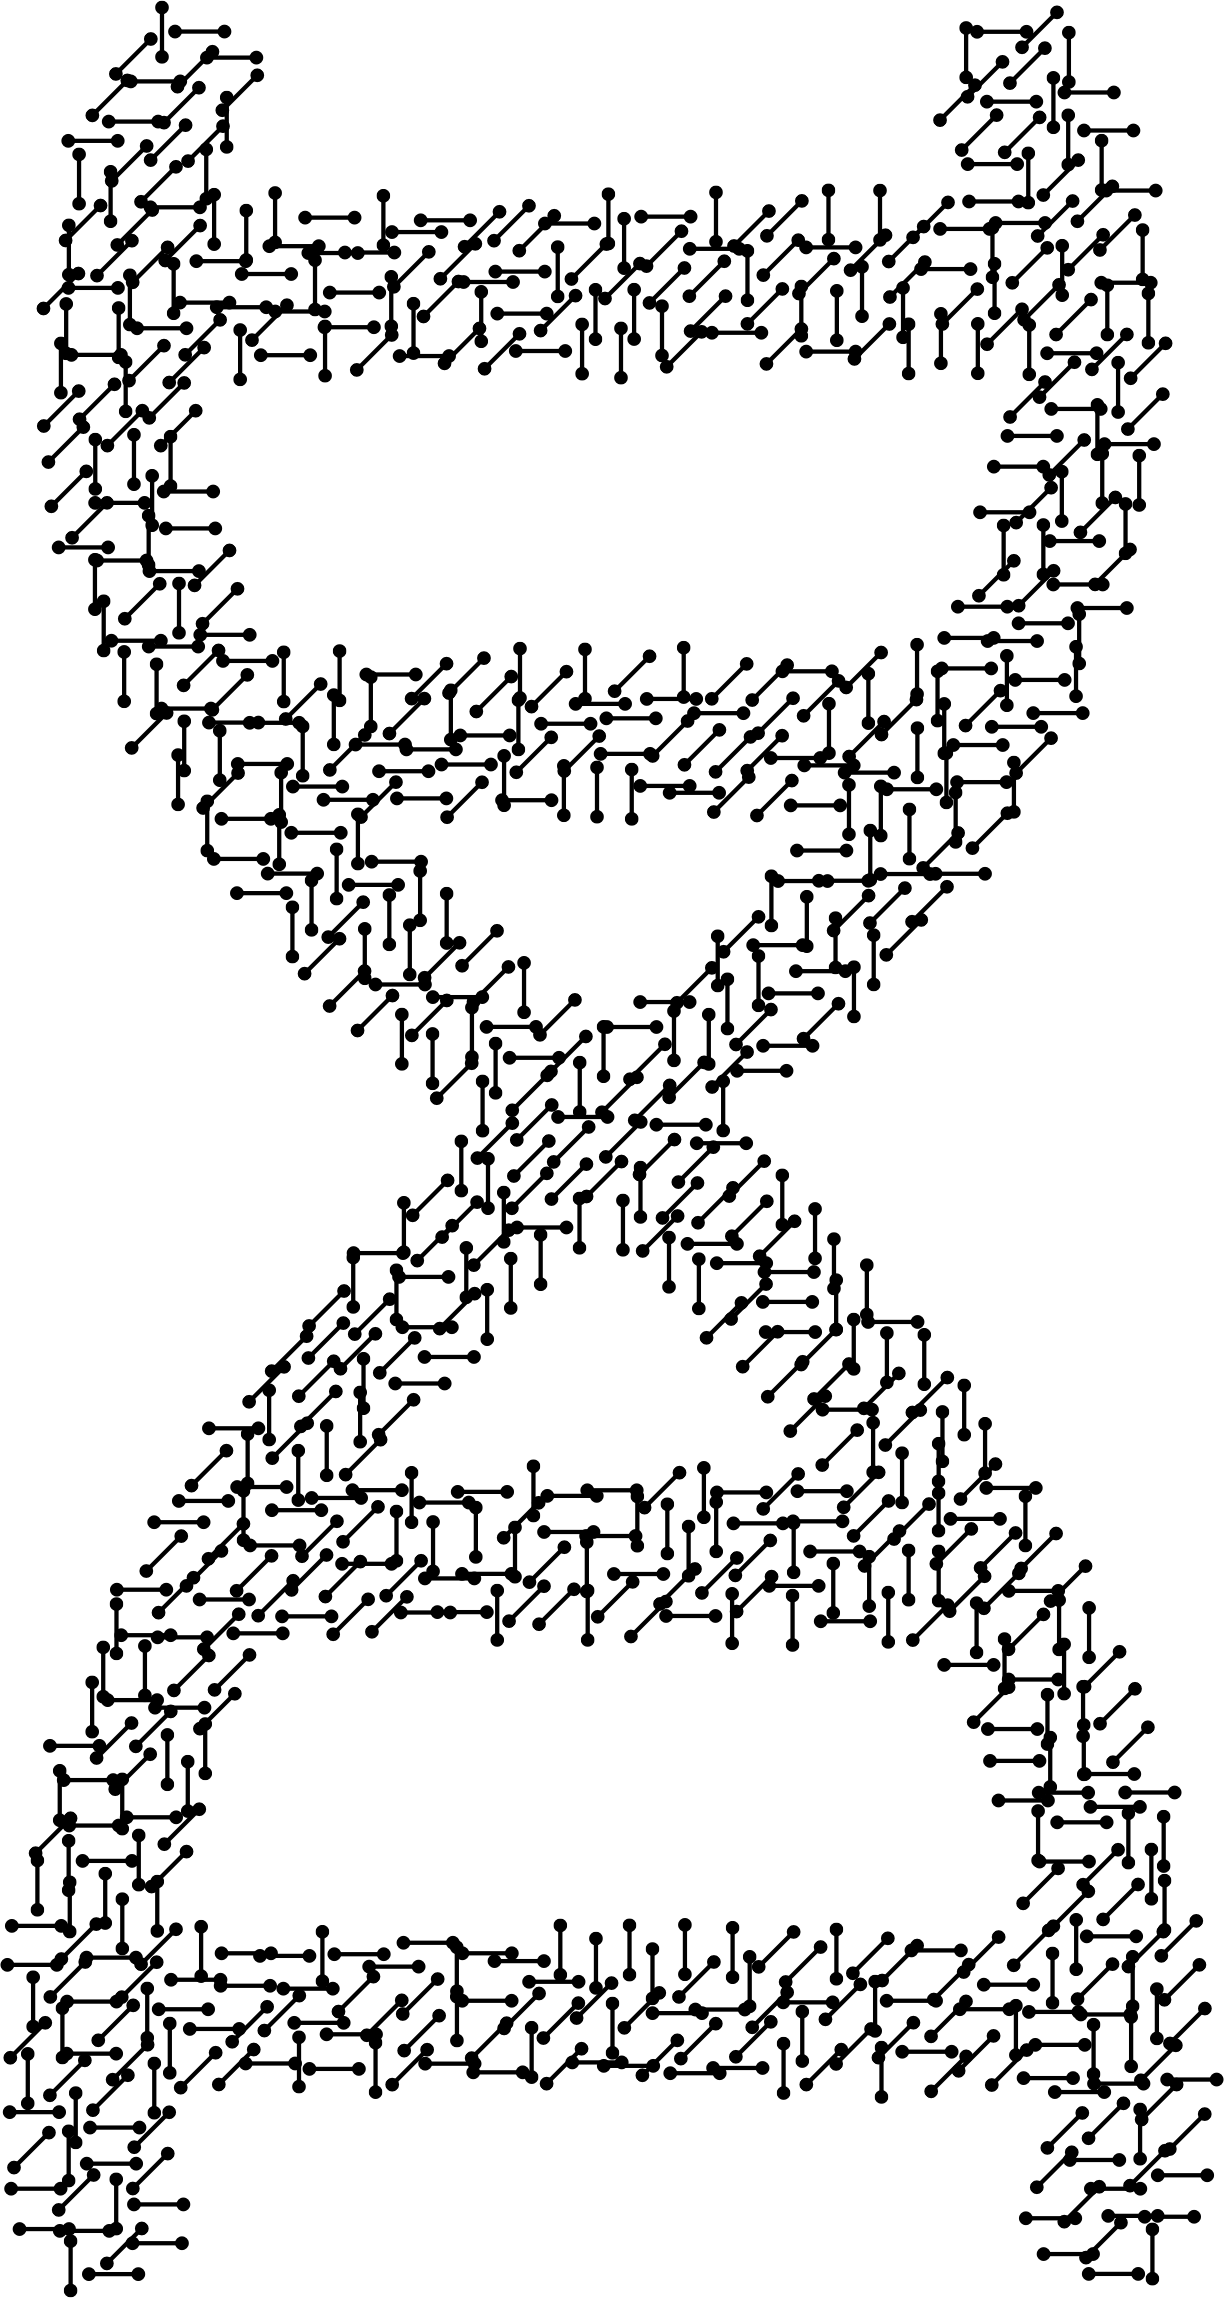 Molecular helix big image. Dna clipart line